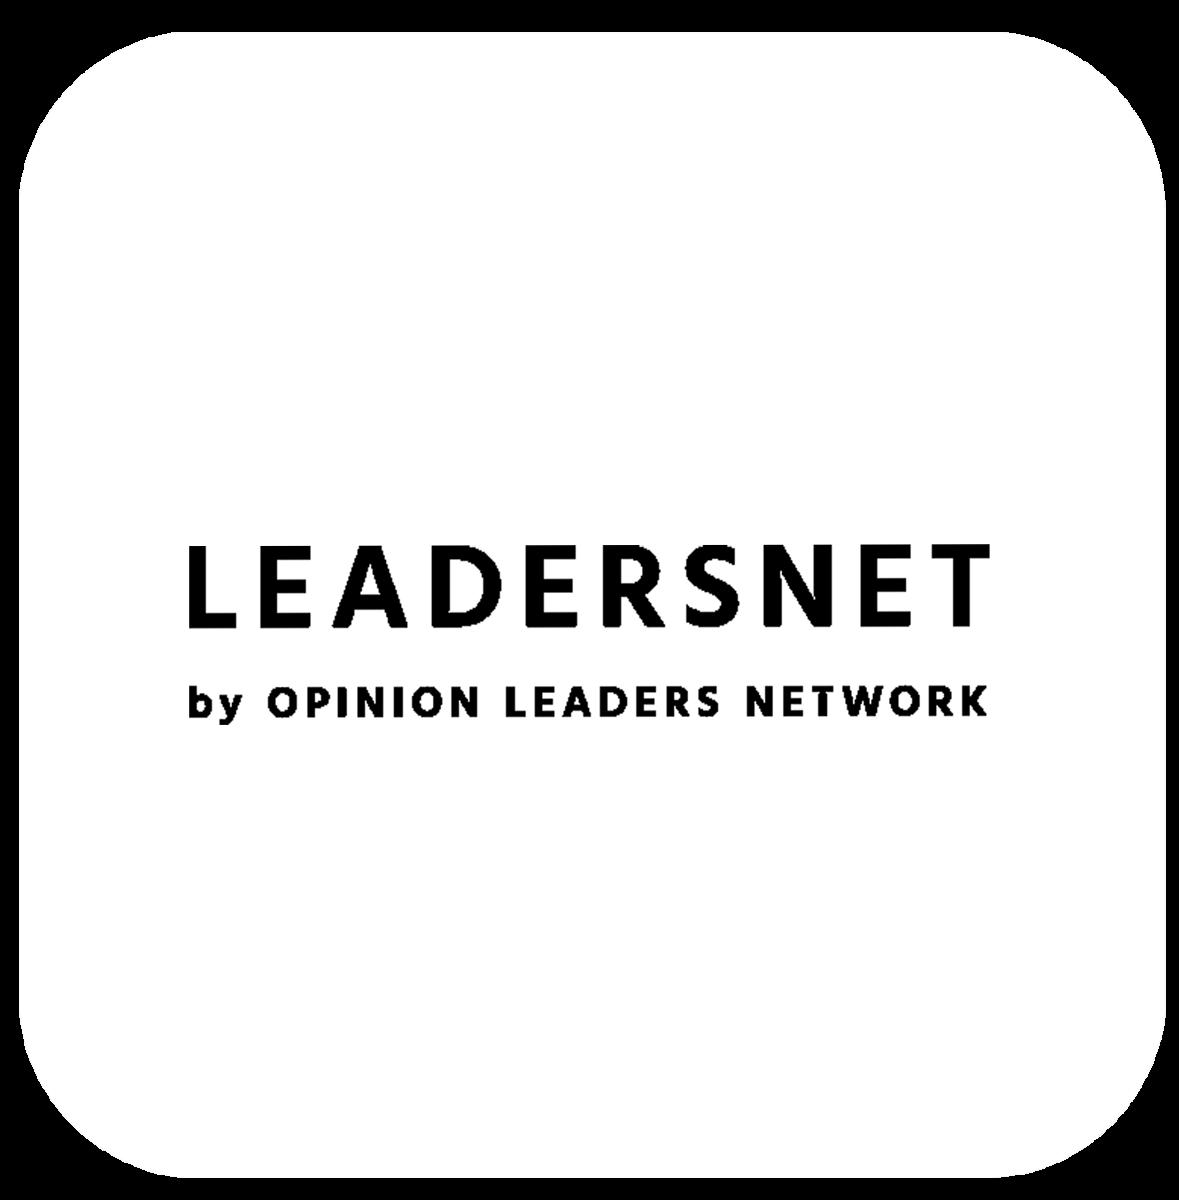 Leadersnet - Presseartikel - Weniger Privatautos.